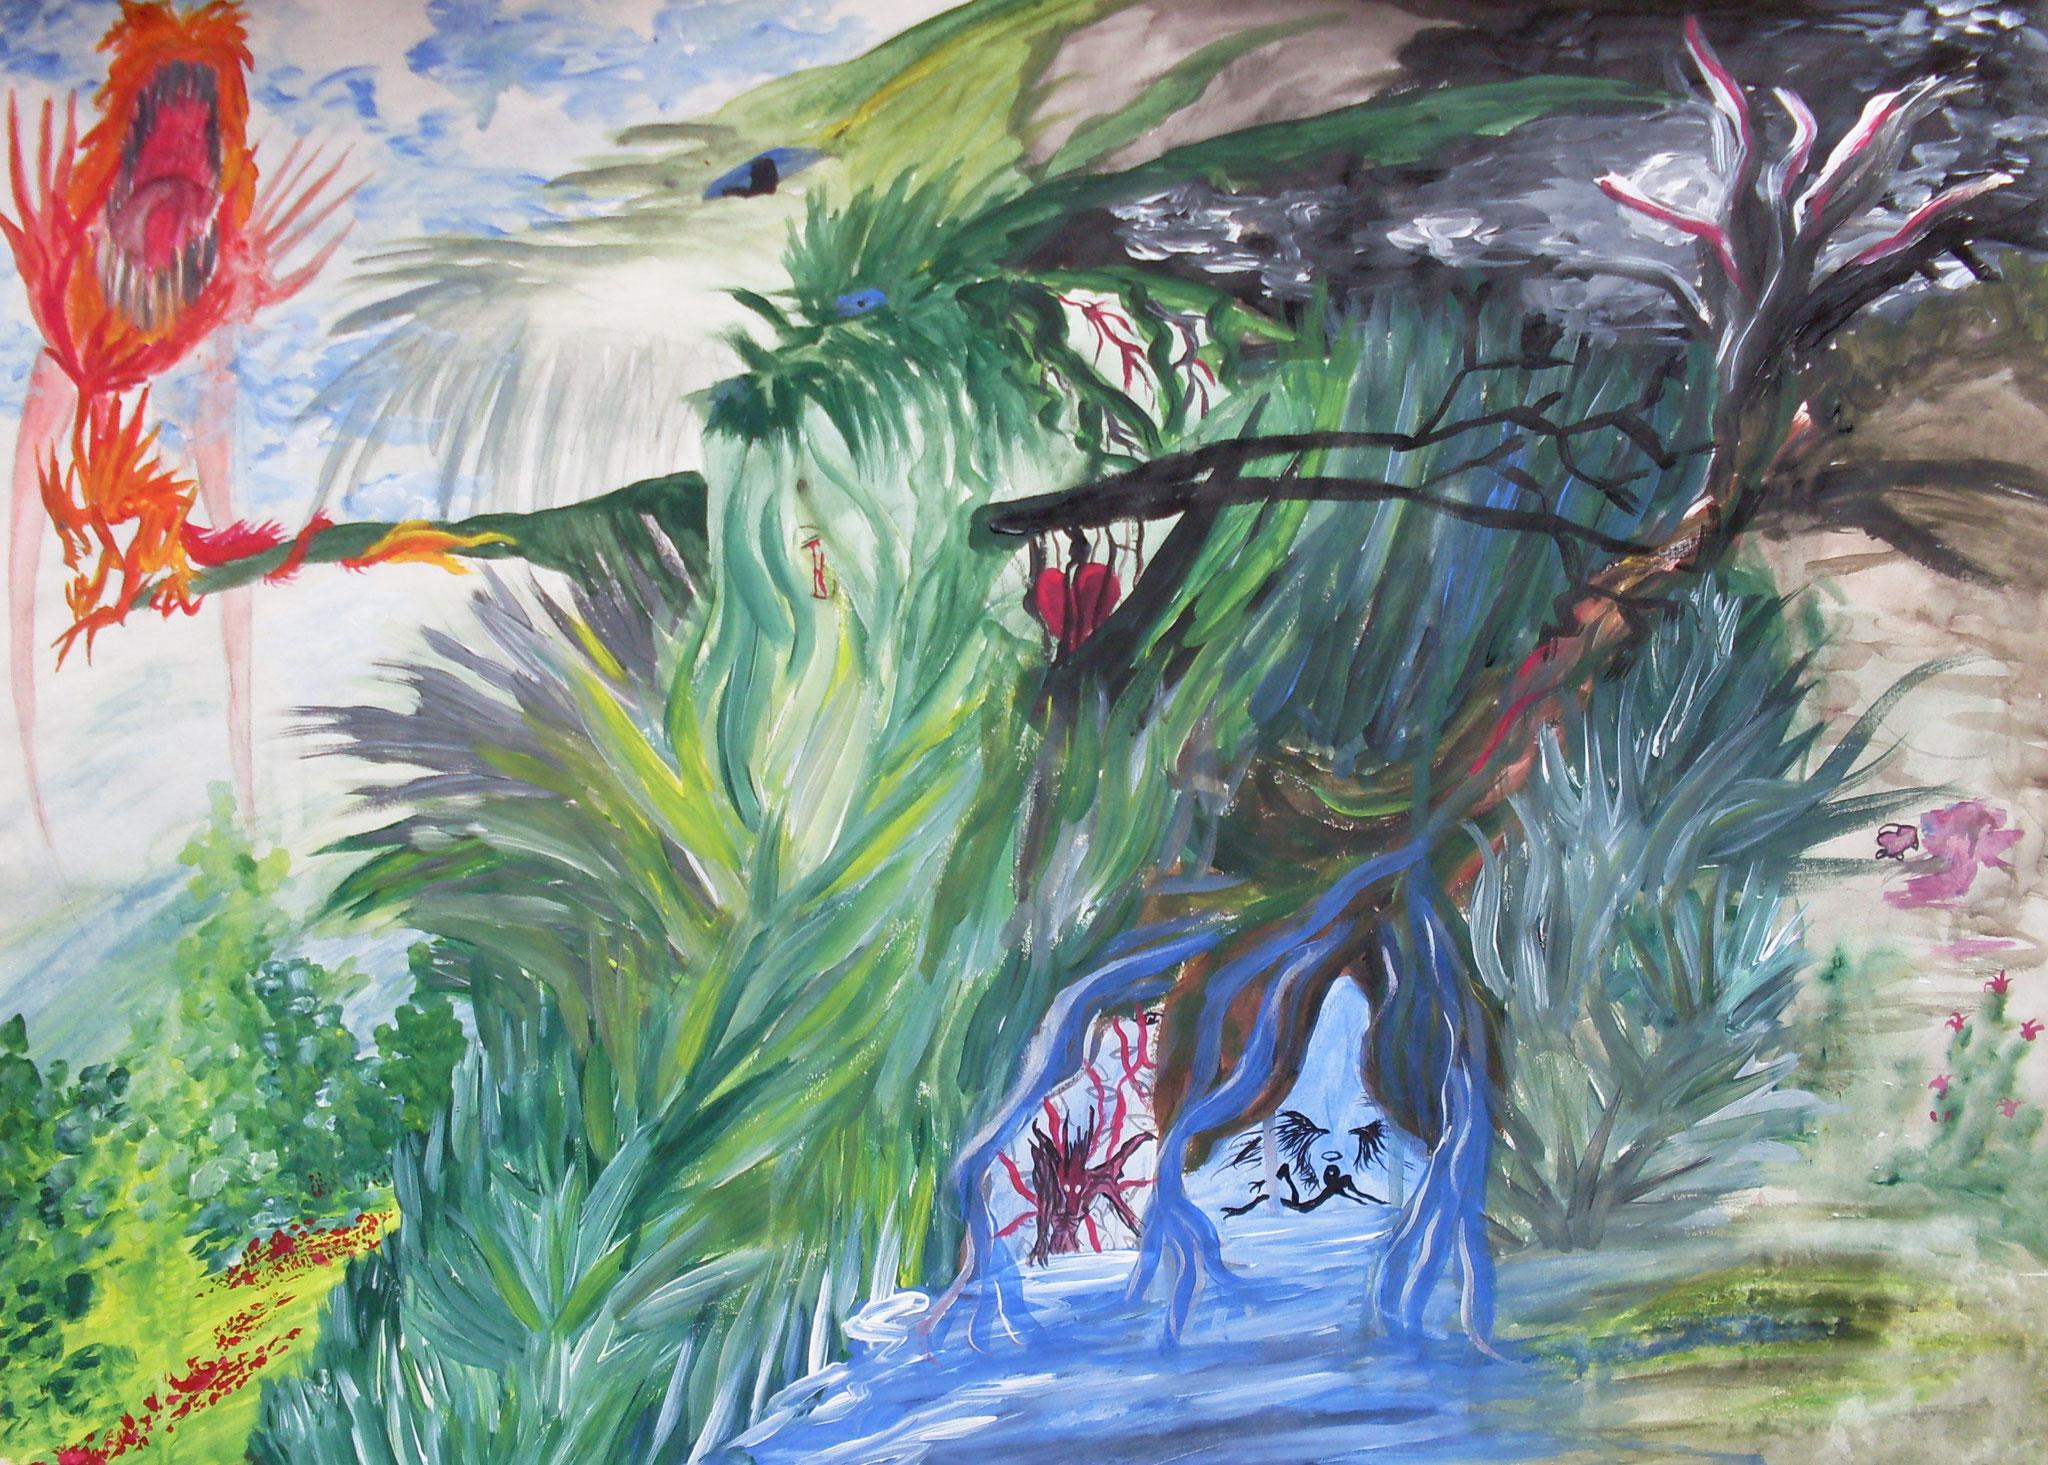 Mutter Natur Acryl auf Papier A2 2004